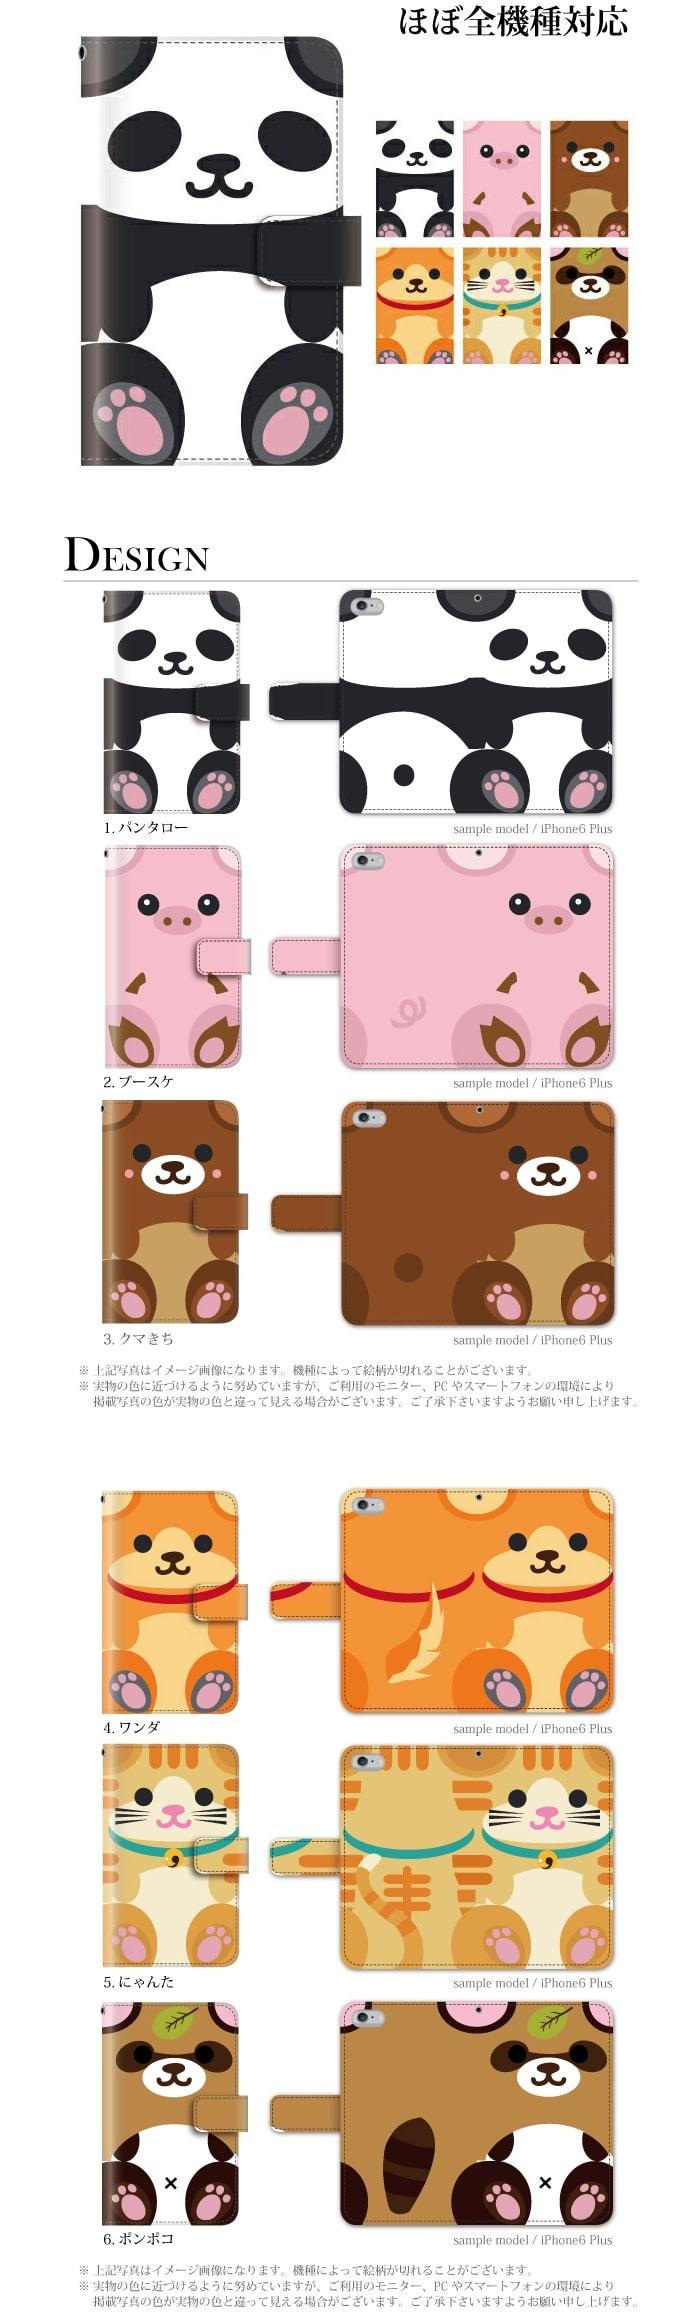 iPhone004